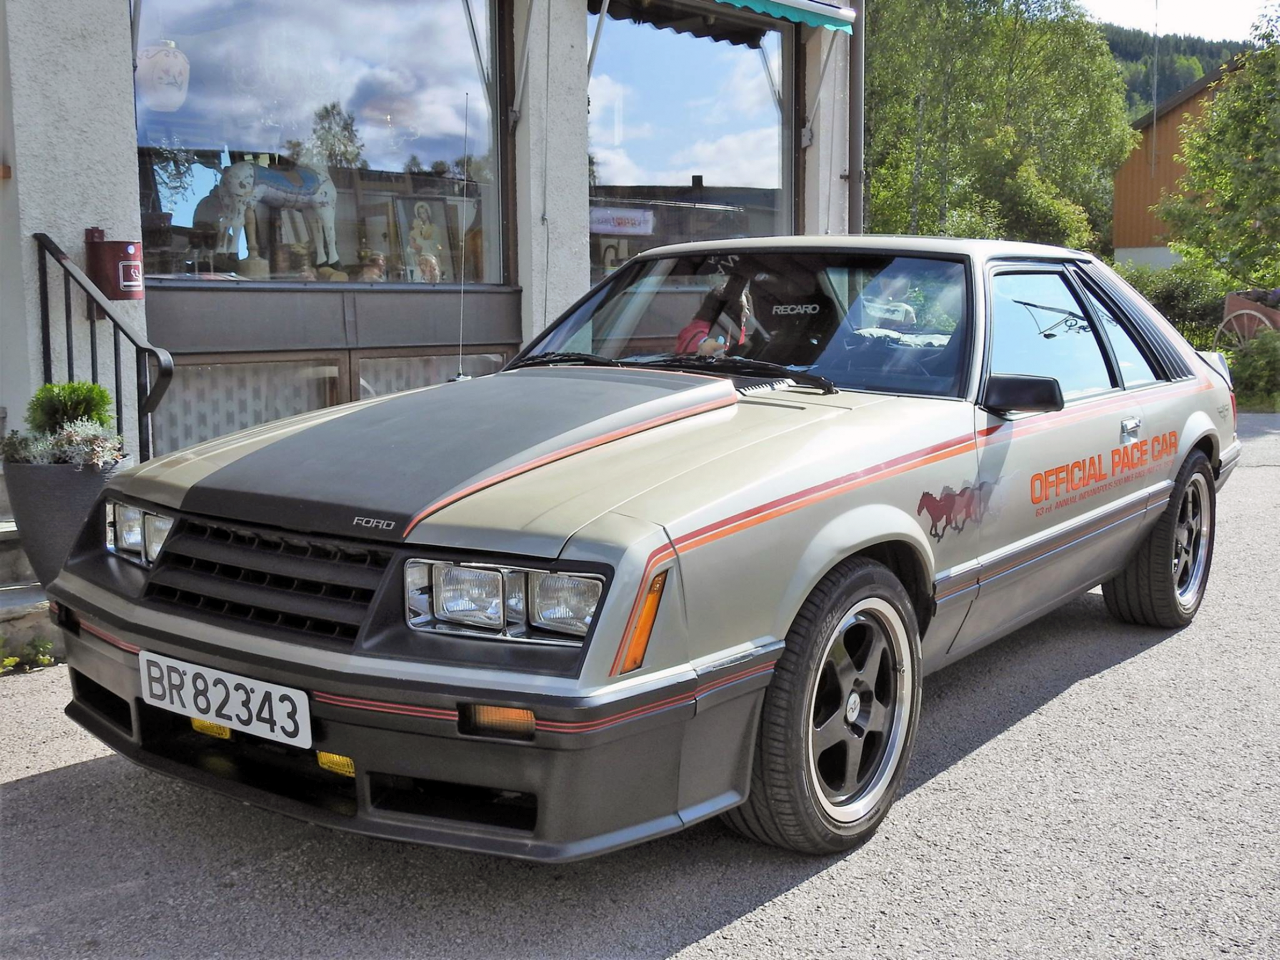 252-1979 Ford Mustang 01. Eier- medlem 252 Morten